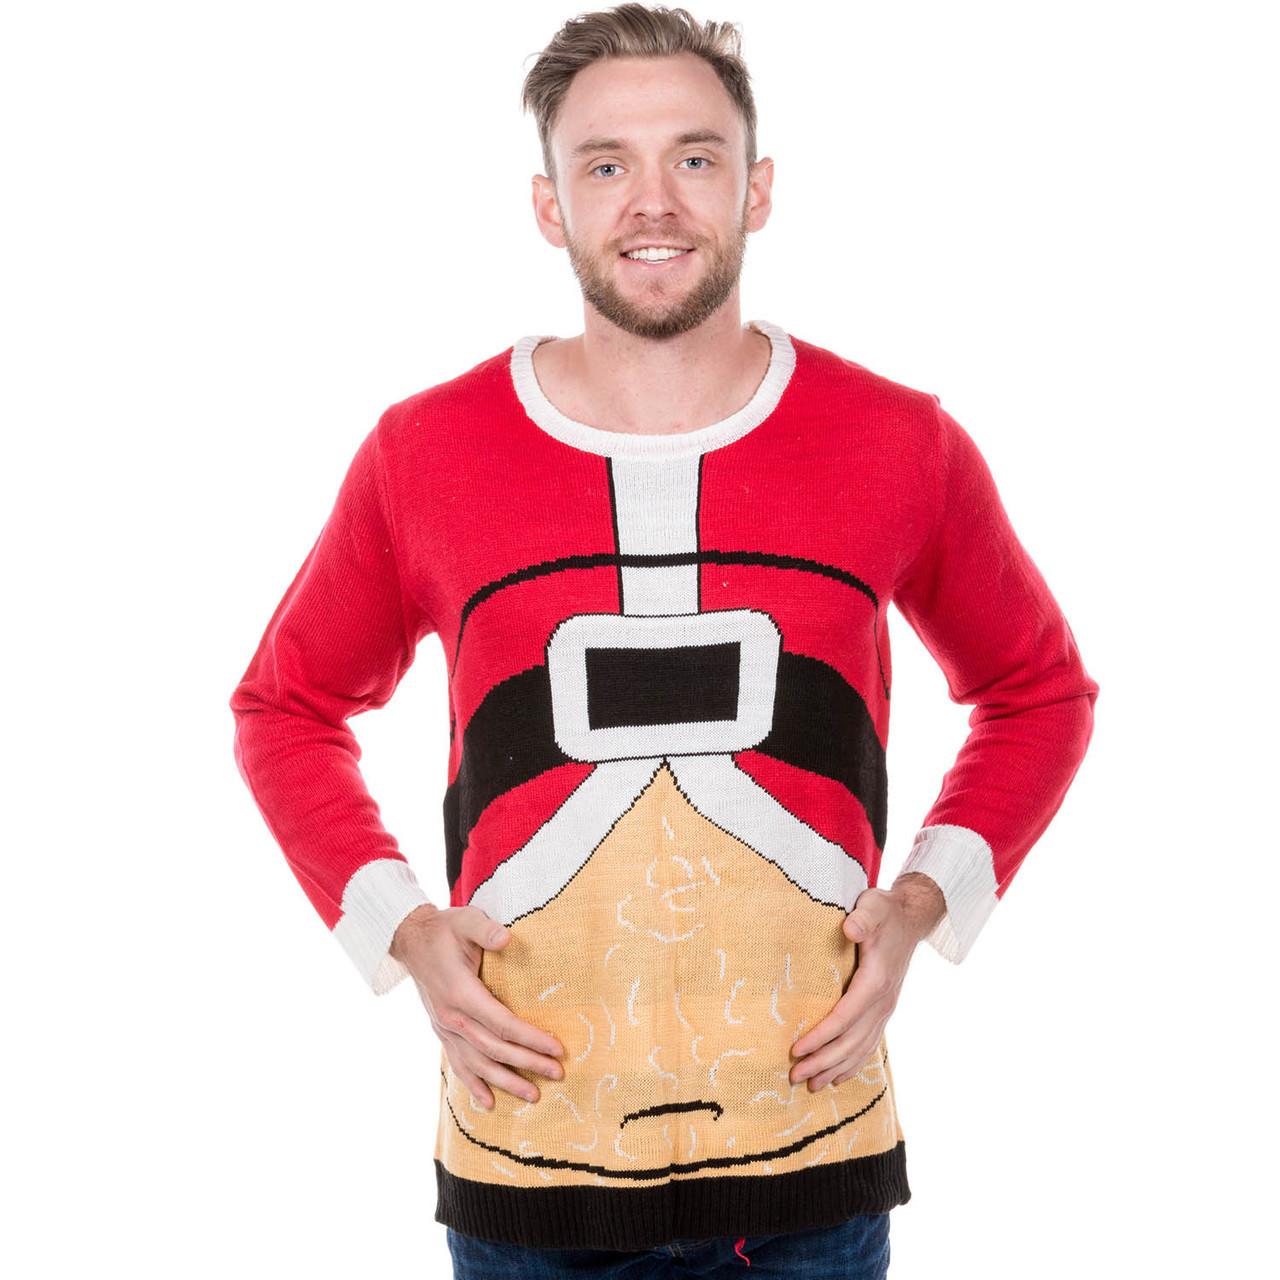 574da23b303 Fat Santa Ugly Christmas Sweater by Forum - RetroFestive.ca